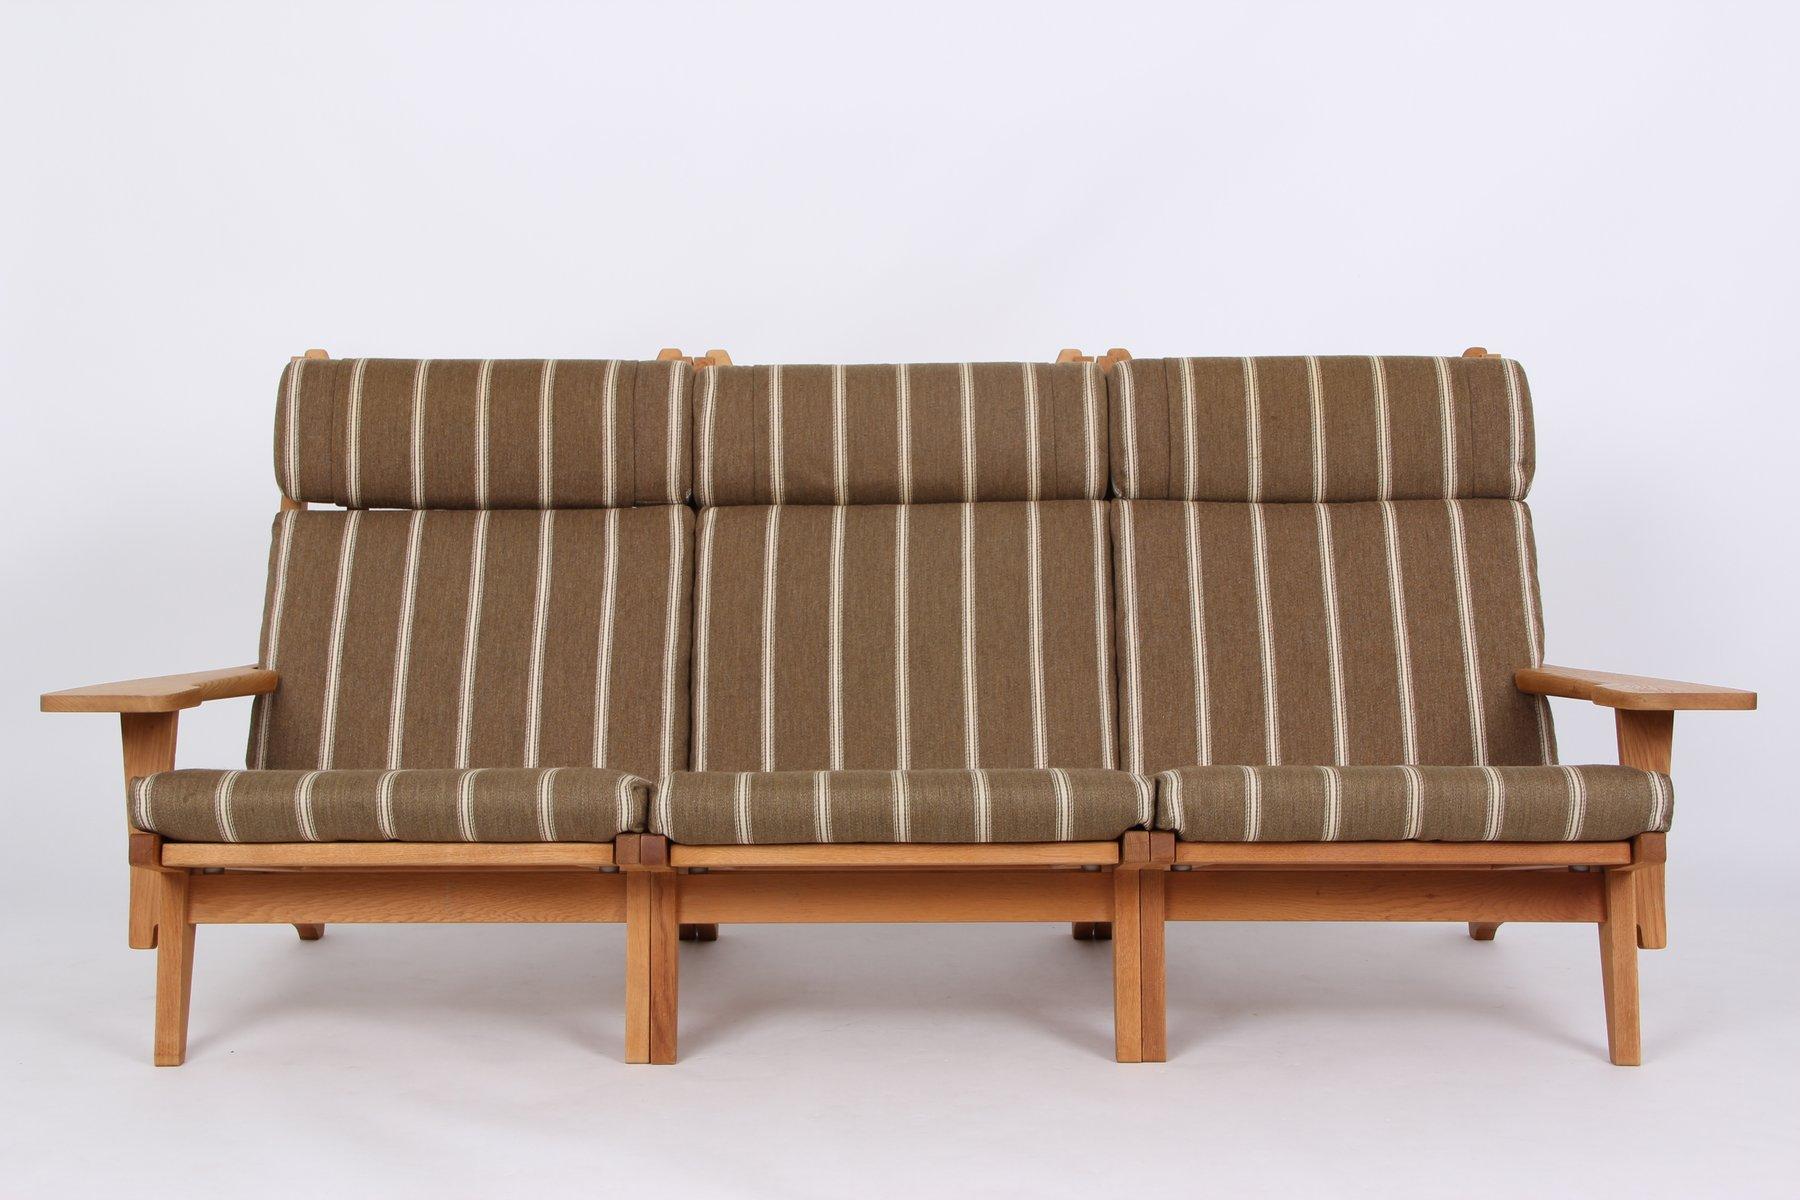 Superieur GE375 Oak U0026 Wool 3 Seater Sofa By Hans J. Wegner For Getama